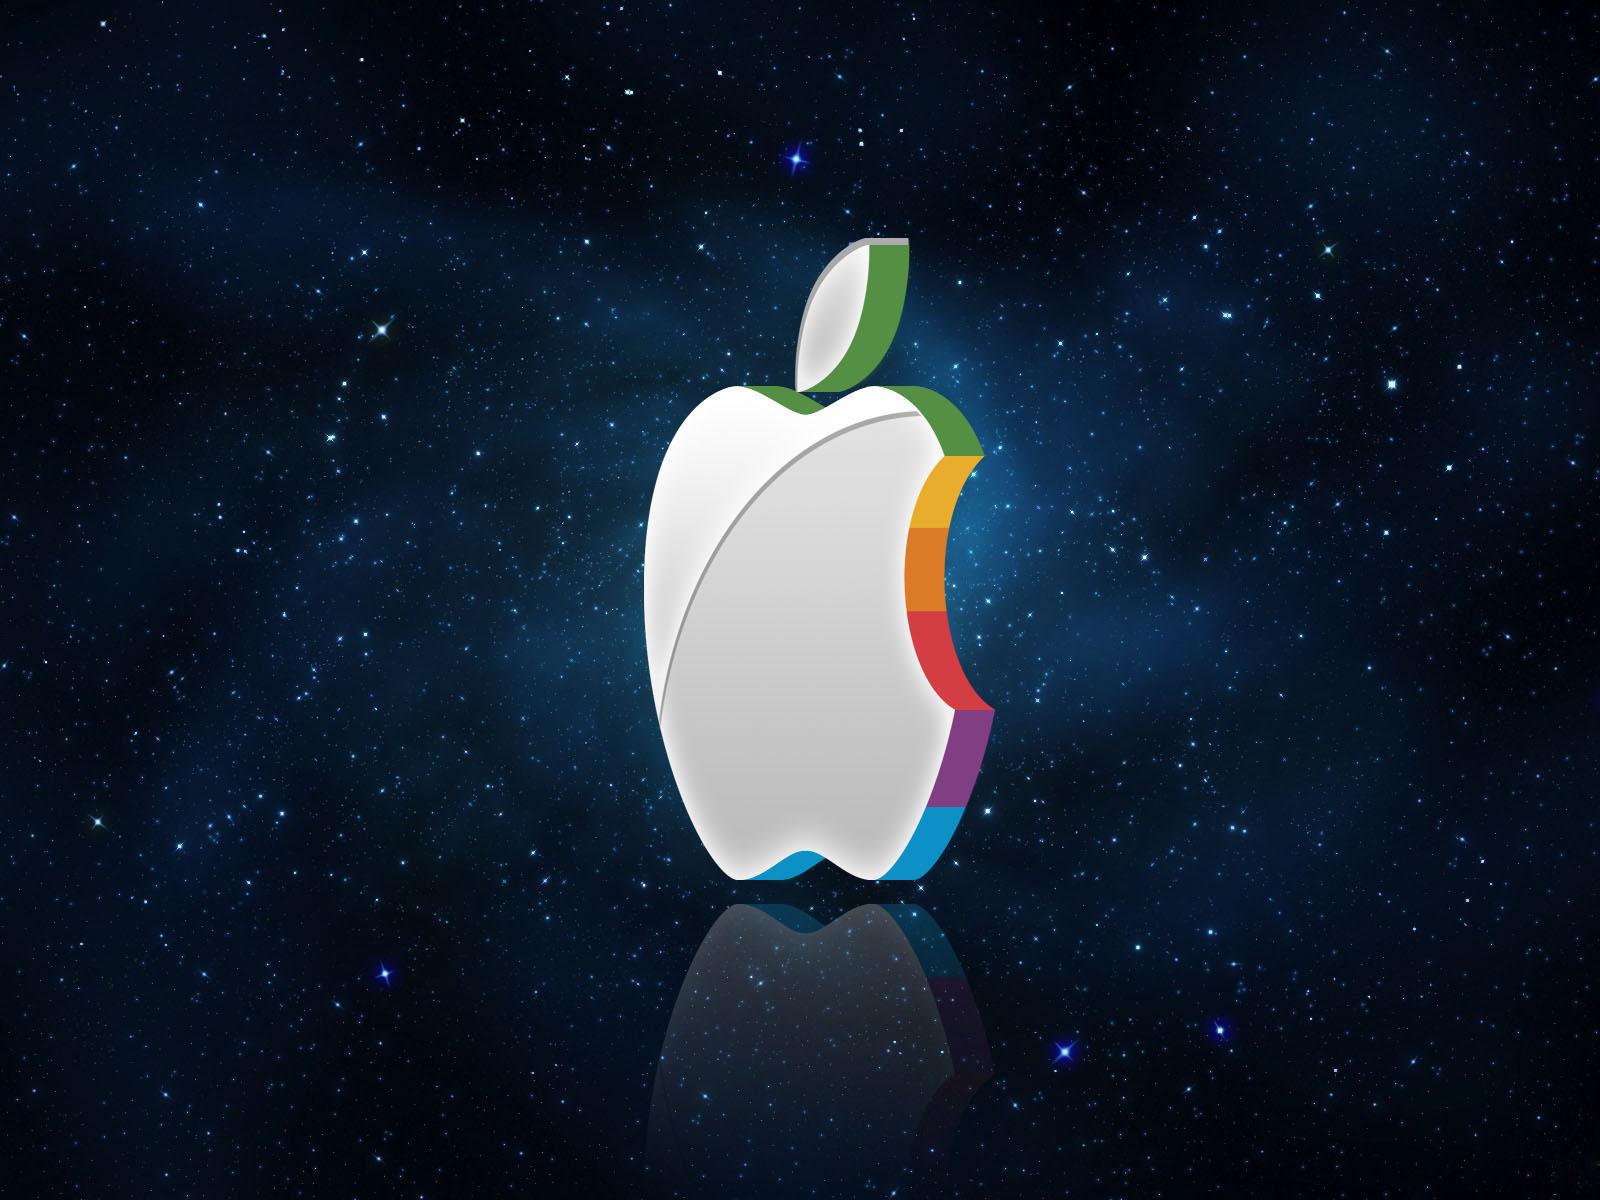 wallpaper: Apple Logo Wallpapers